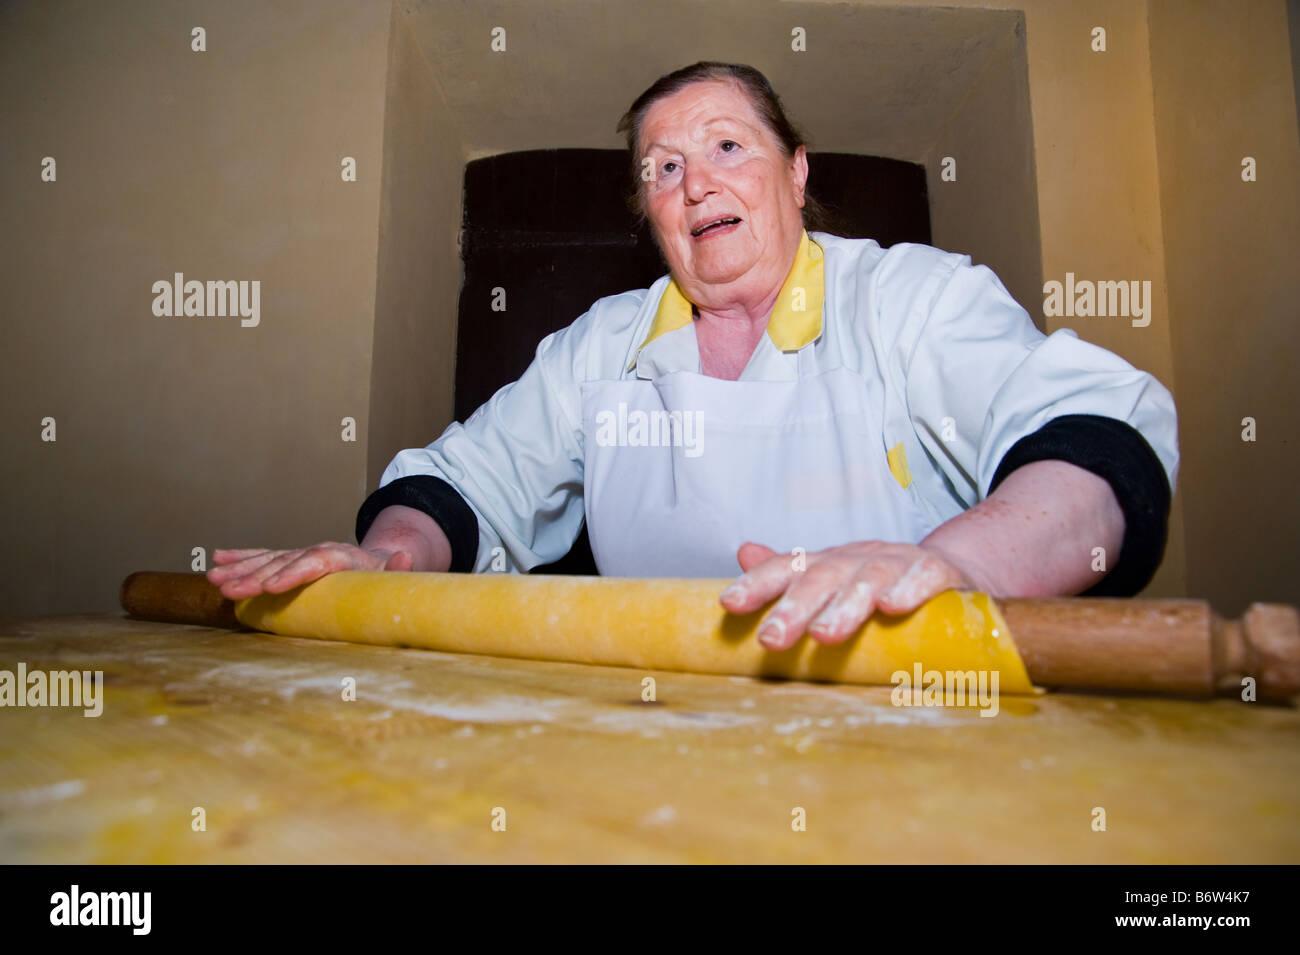 Woman preparing handmade pasta. - Stock Image